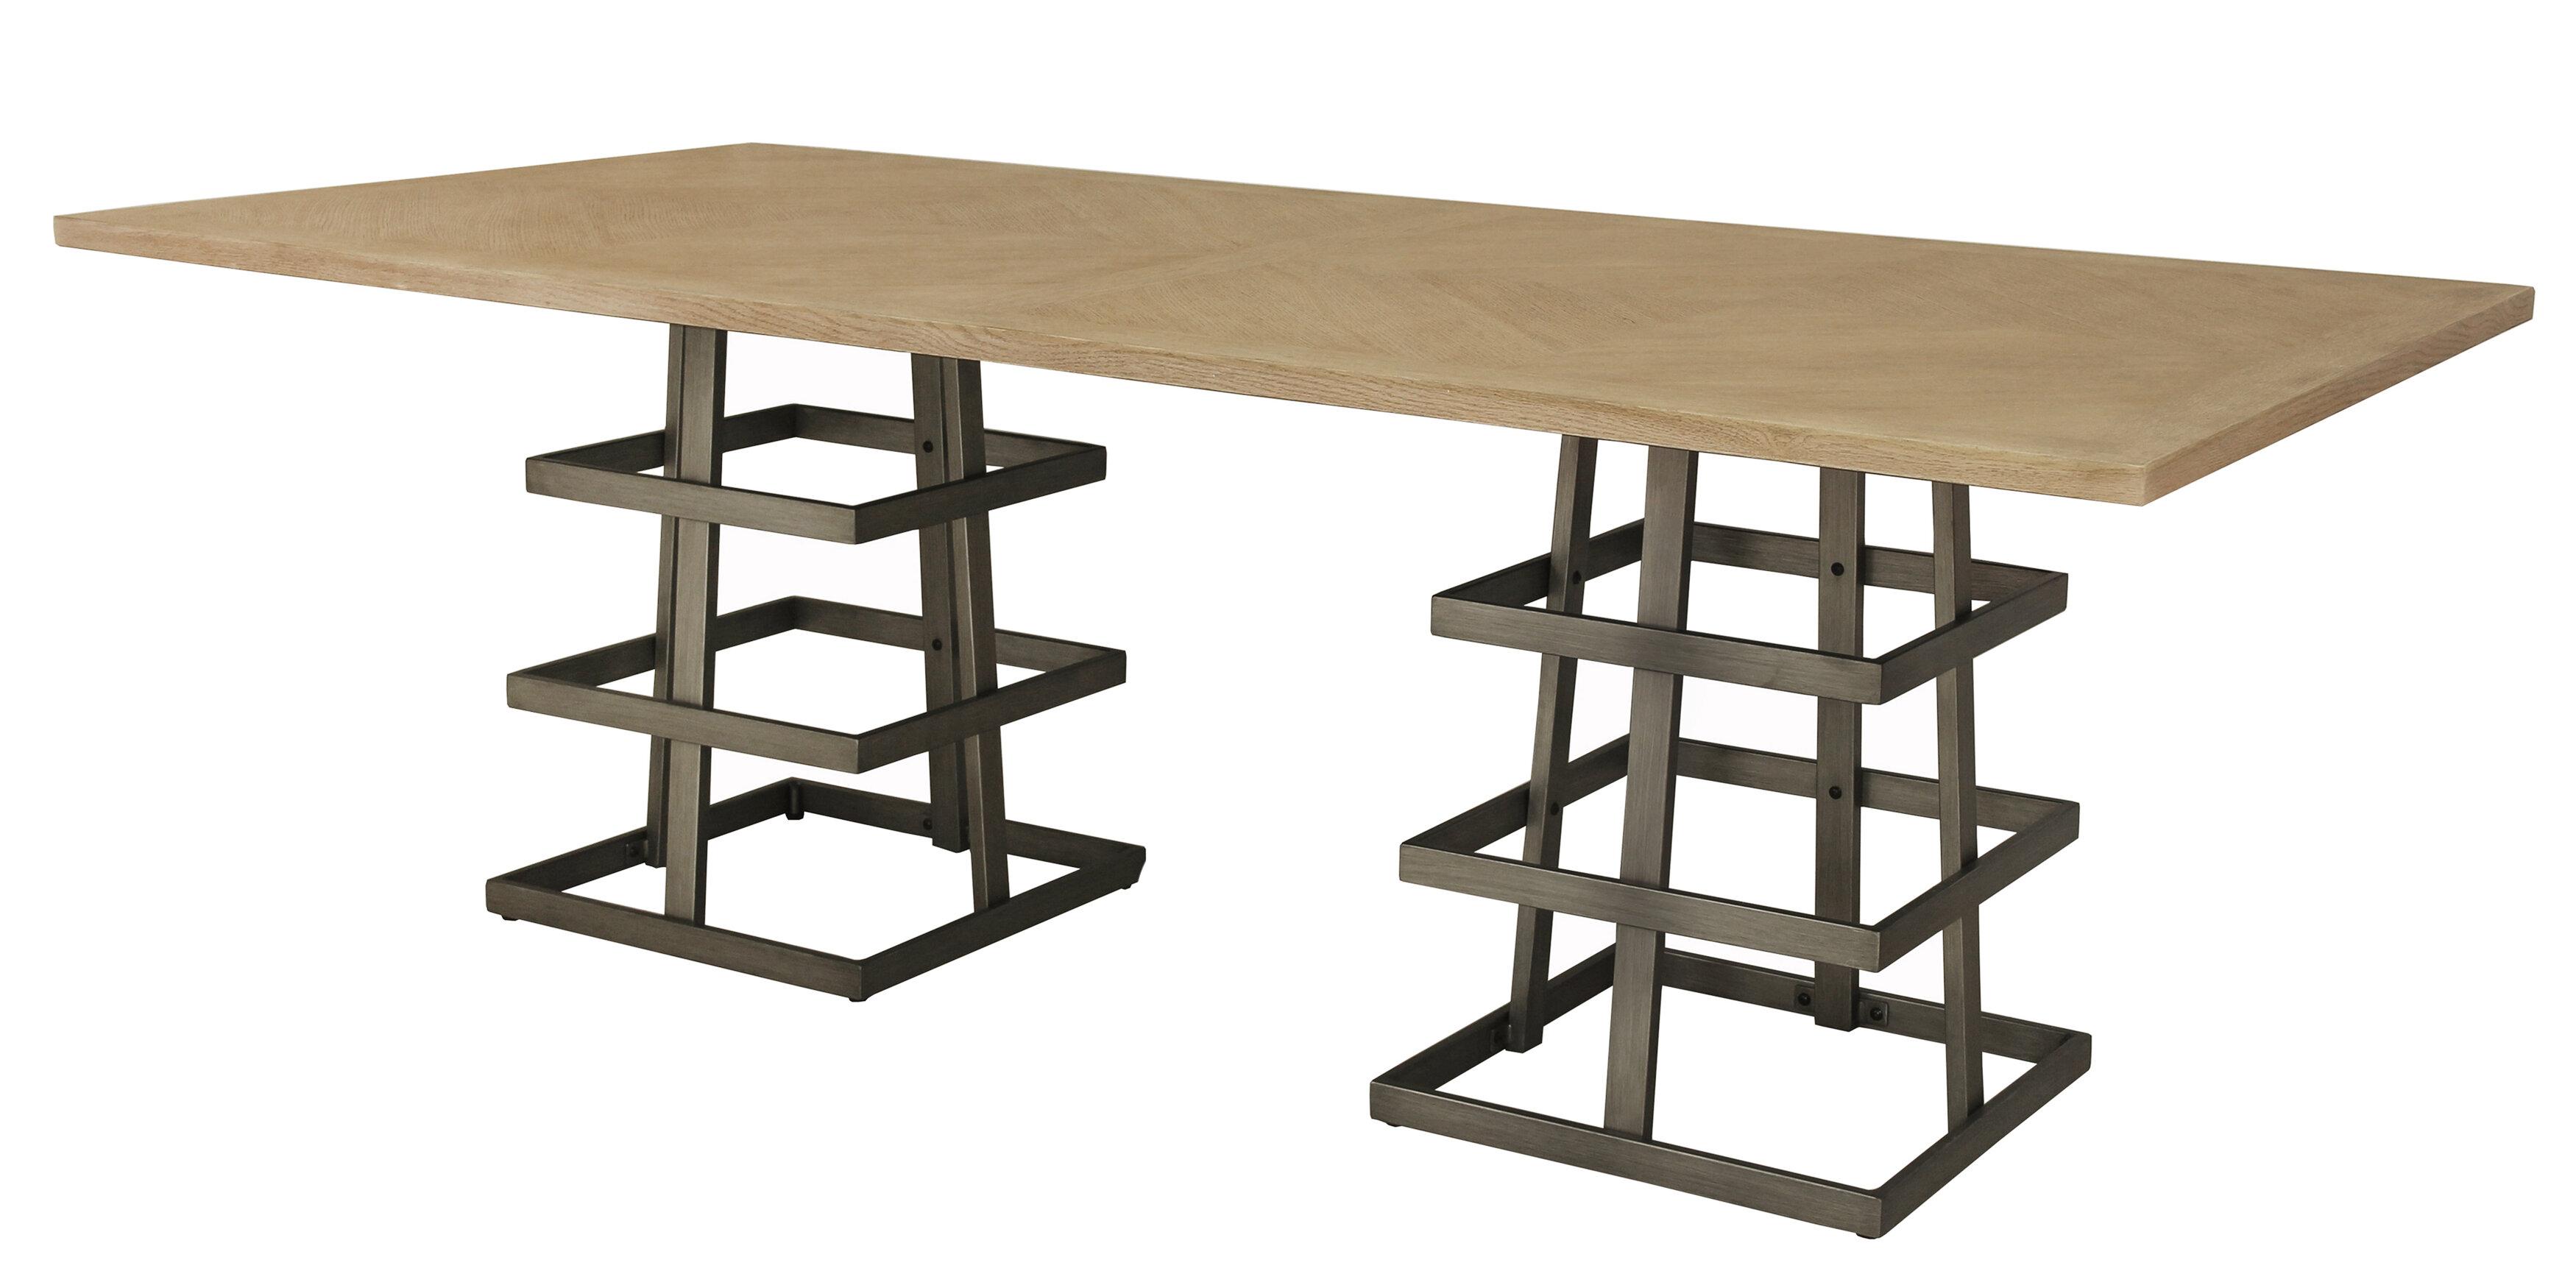 17 Stories Tulane Dual Pedestal Dining Table Reviews Wayfair